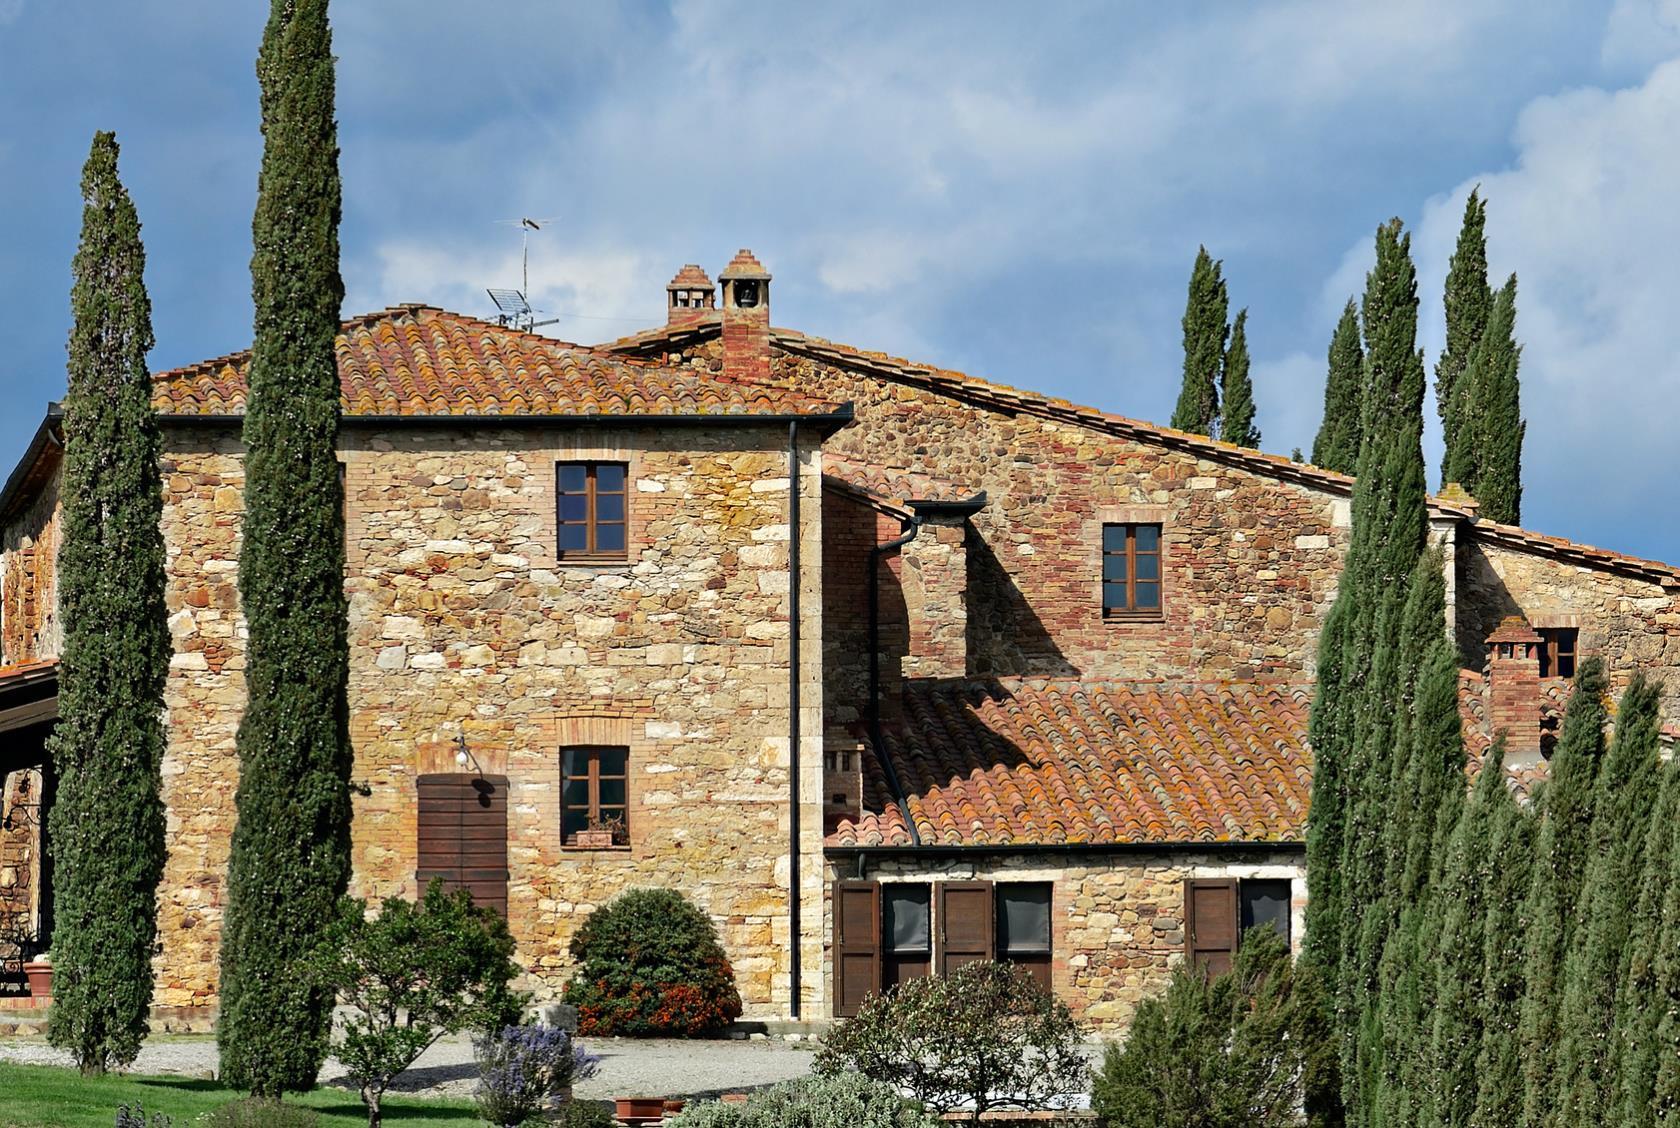 Appartamenti vacanza in toscana San Gimignano Firenze